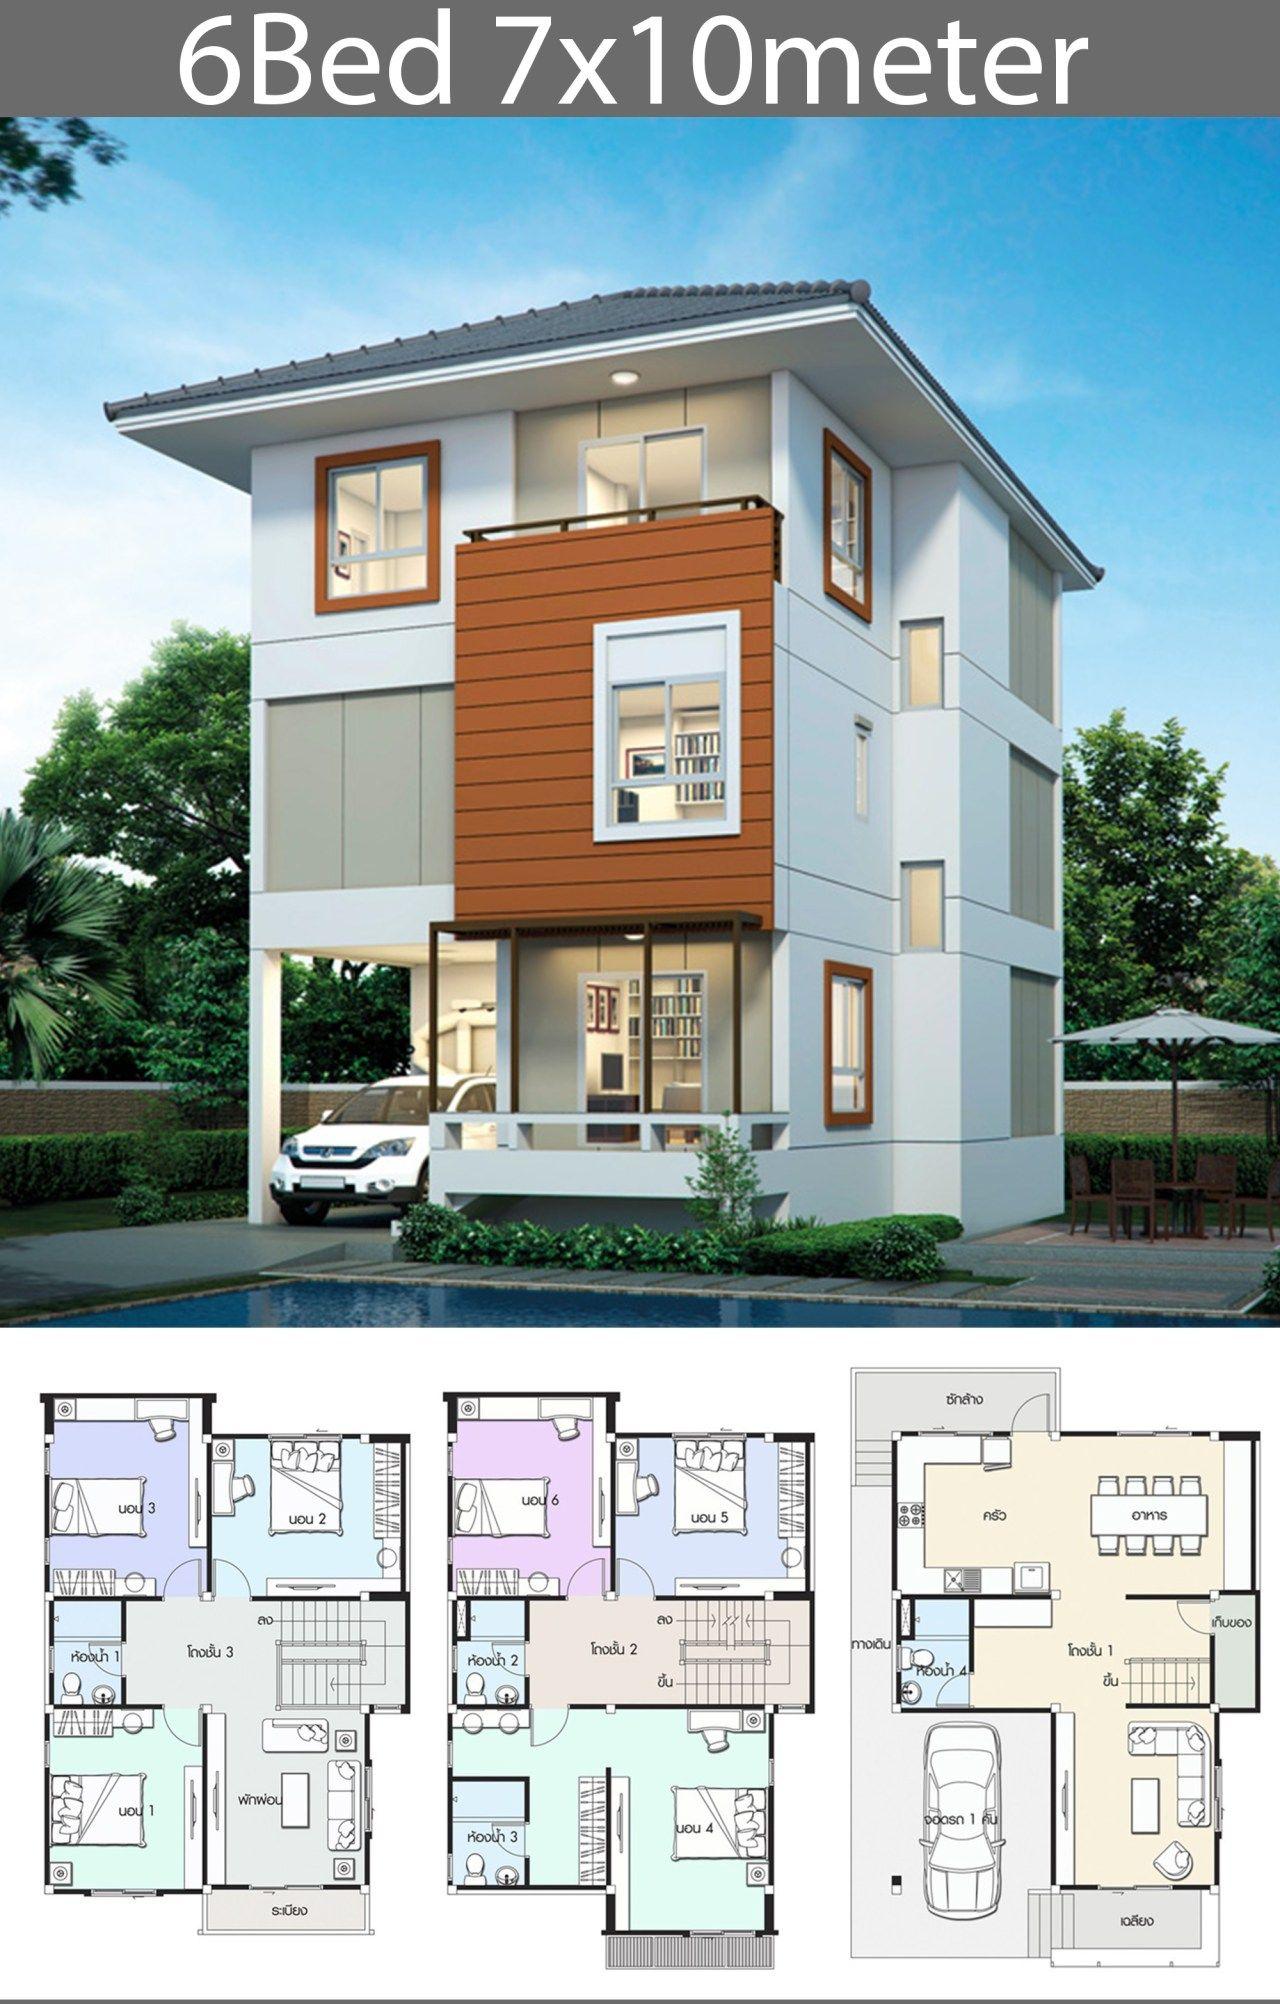 5 Ideas Home Design Plan 7x10m Samphoas Plan Modern House Plans Home Design Plans Home Design Plan